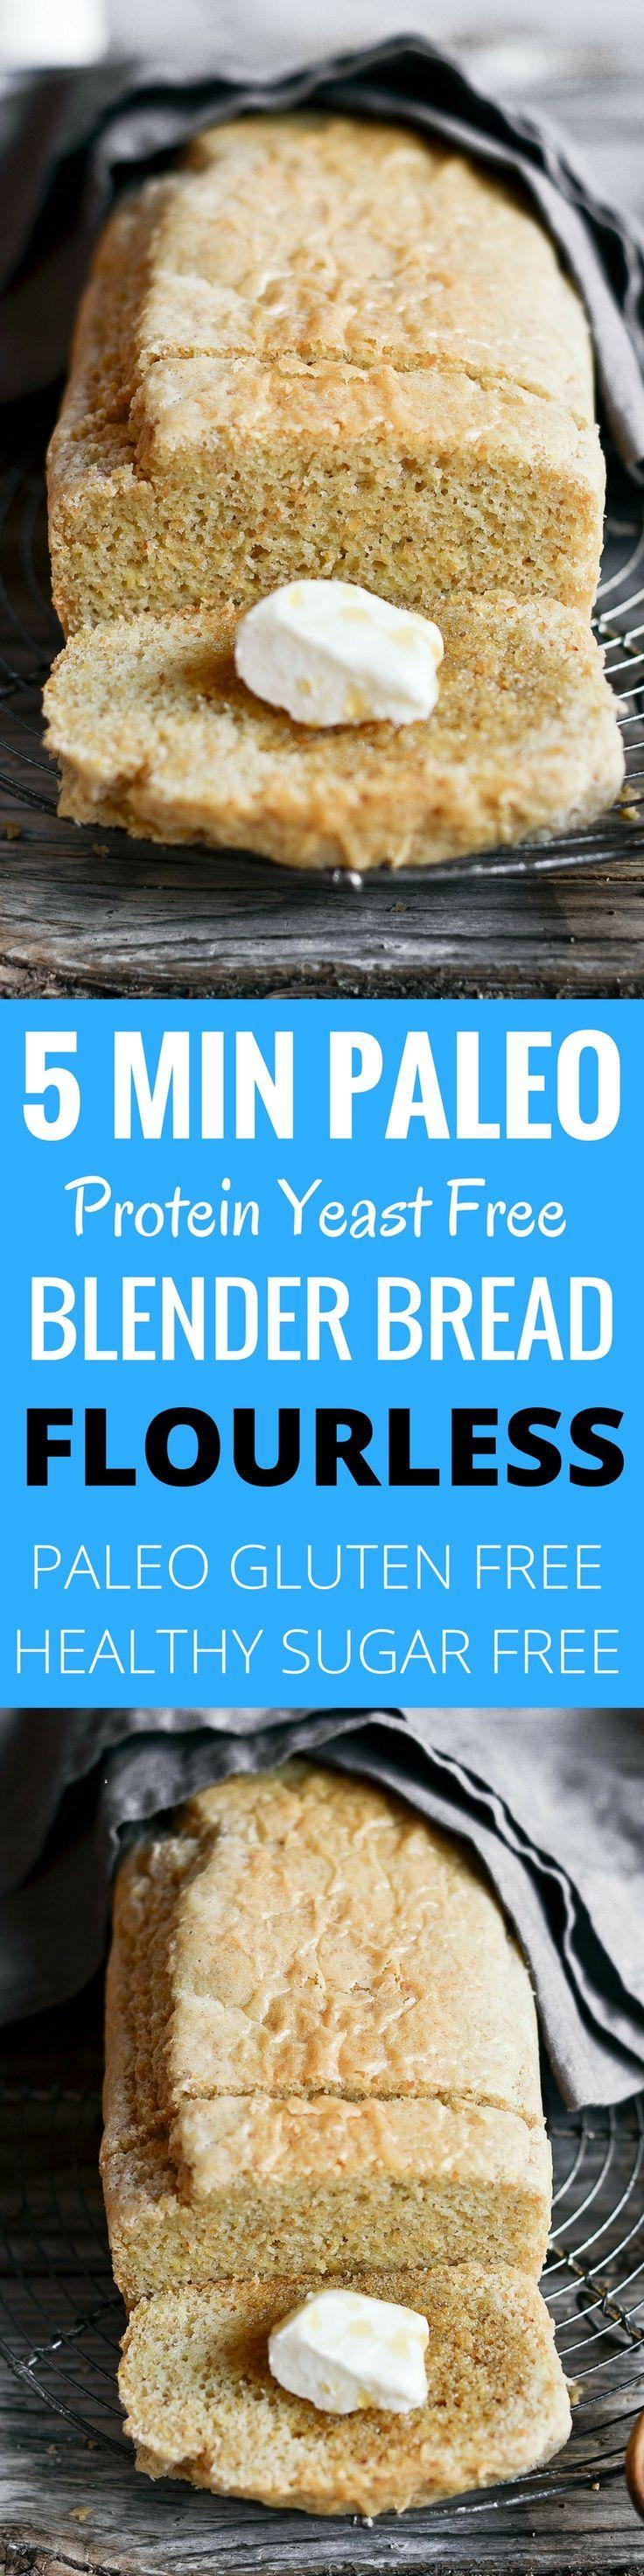 Mind blowing 5 min PALEO blender bread! Soft, NO yeast! Tastes like real homemade bread. Best gluten free bread recipe.